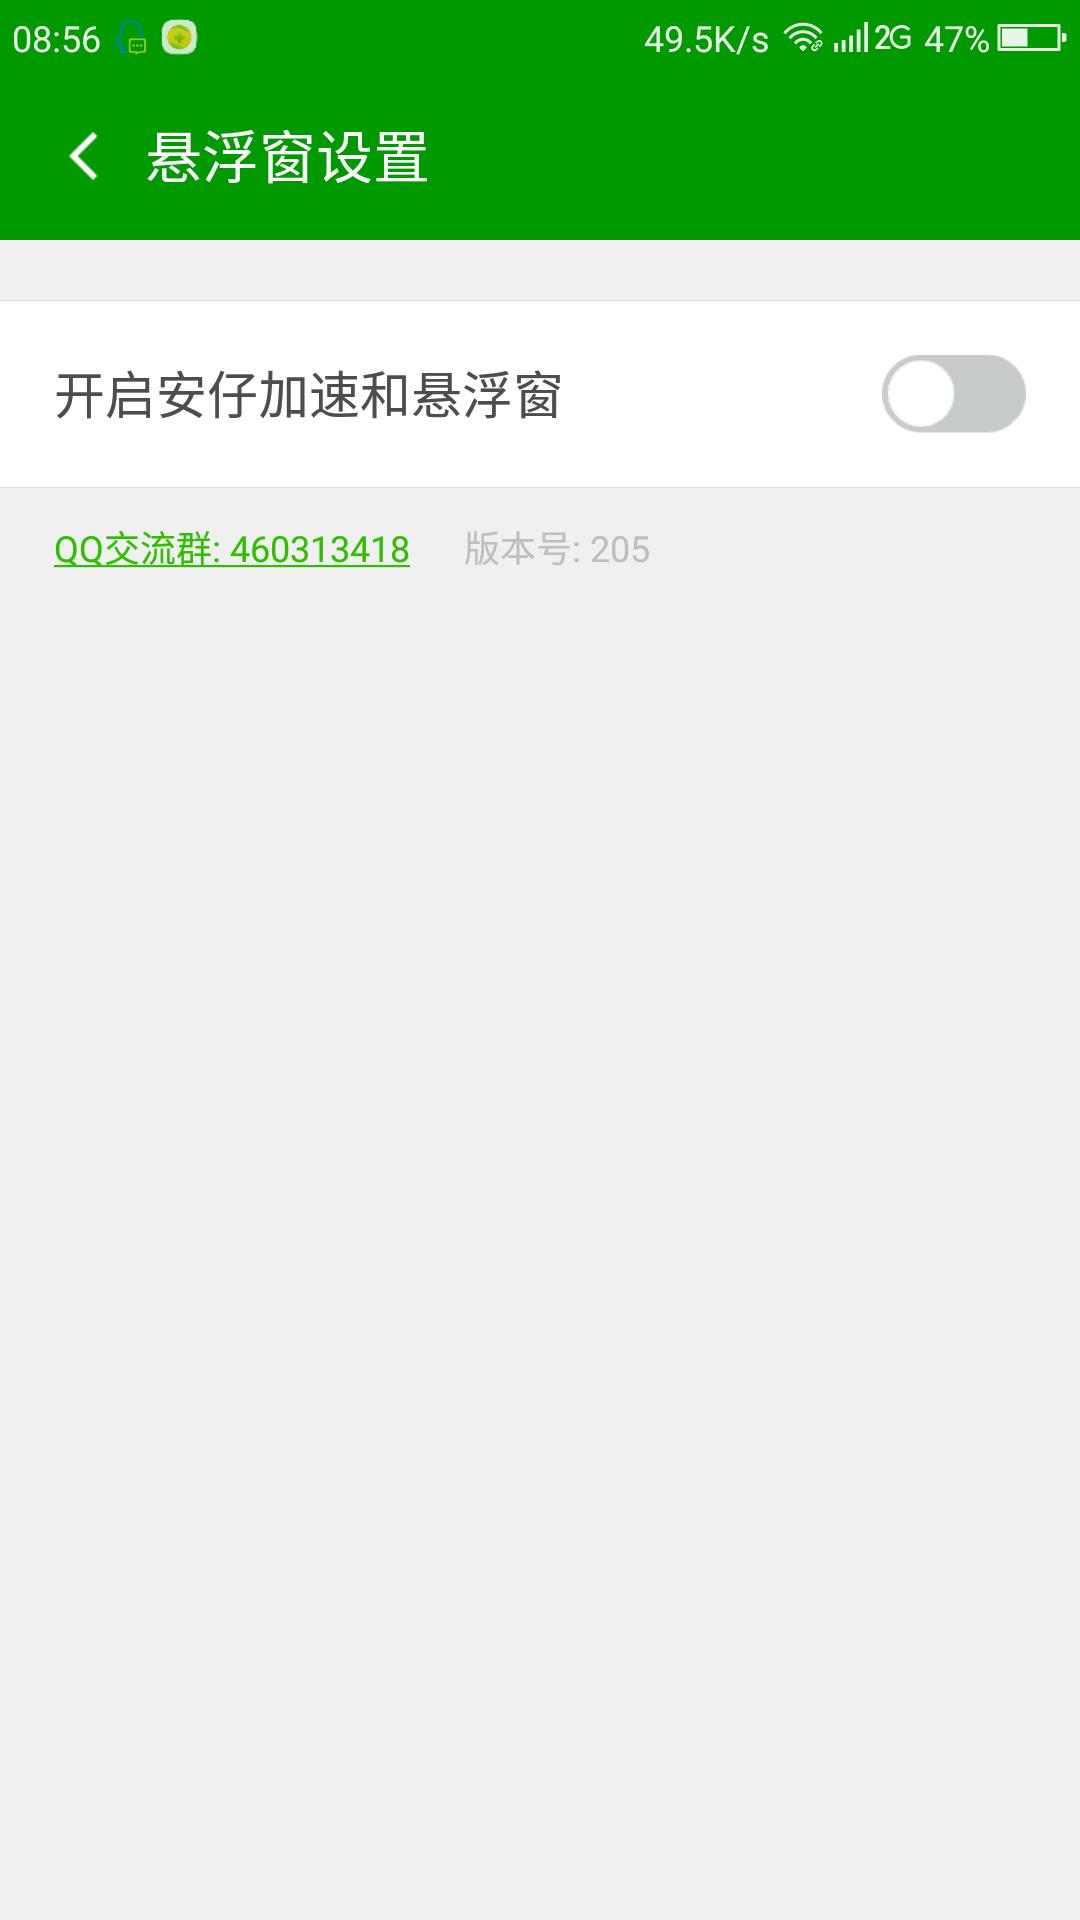 Screenshot_2018-01-26-08-56-37.png